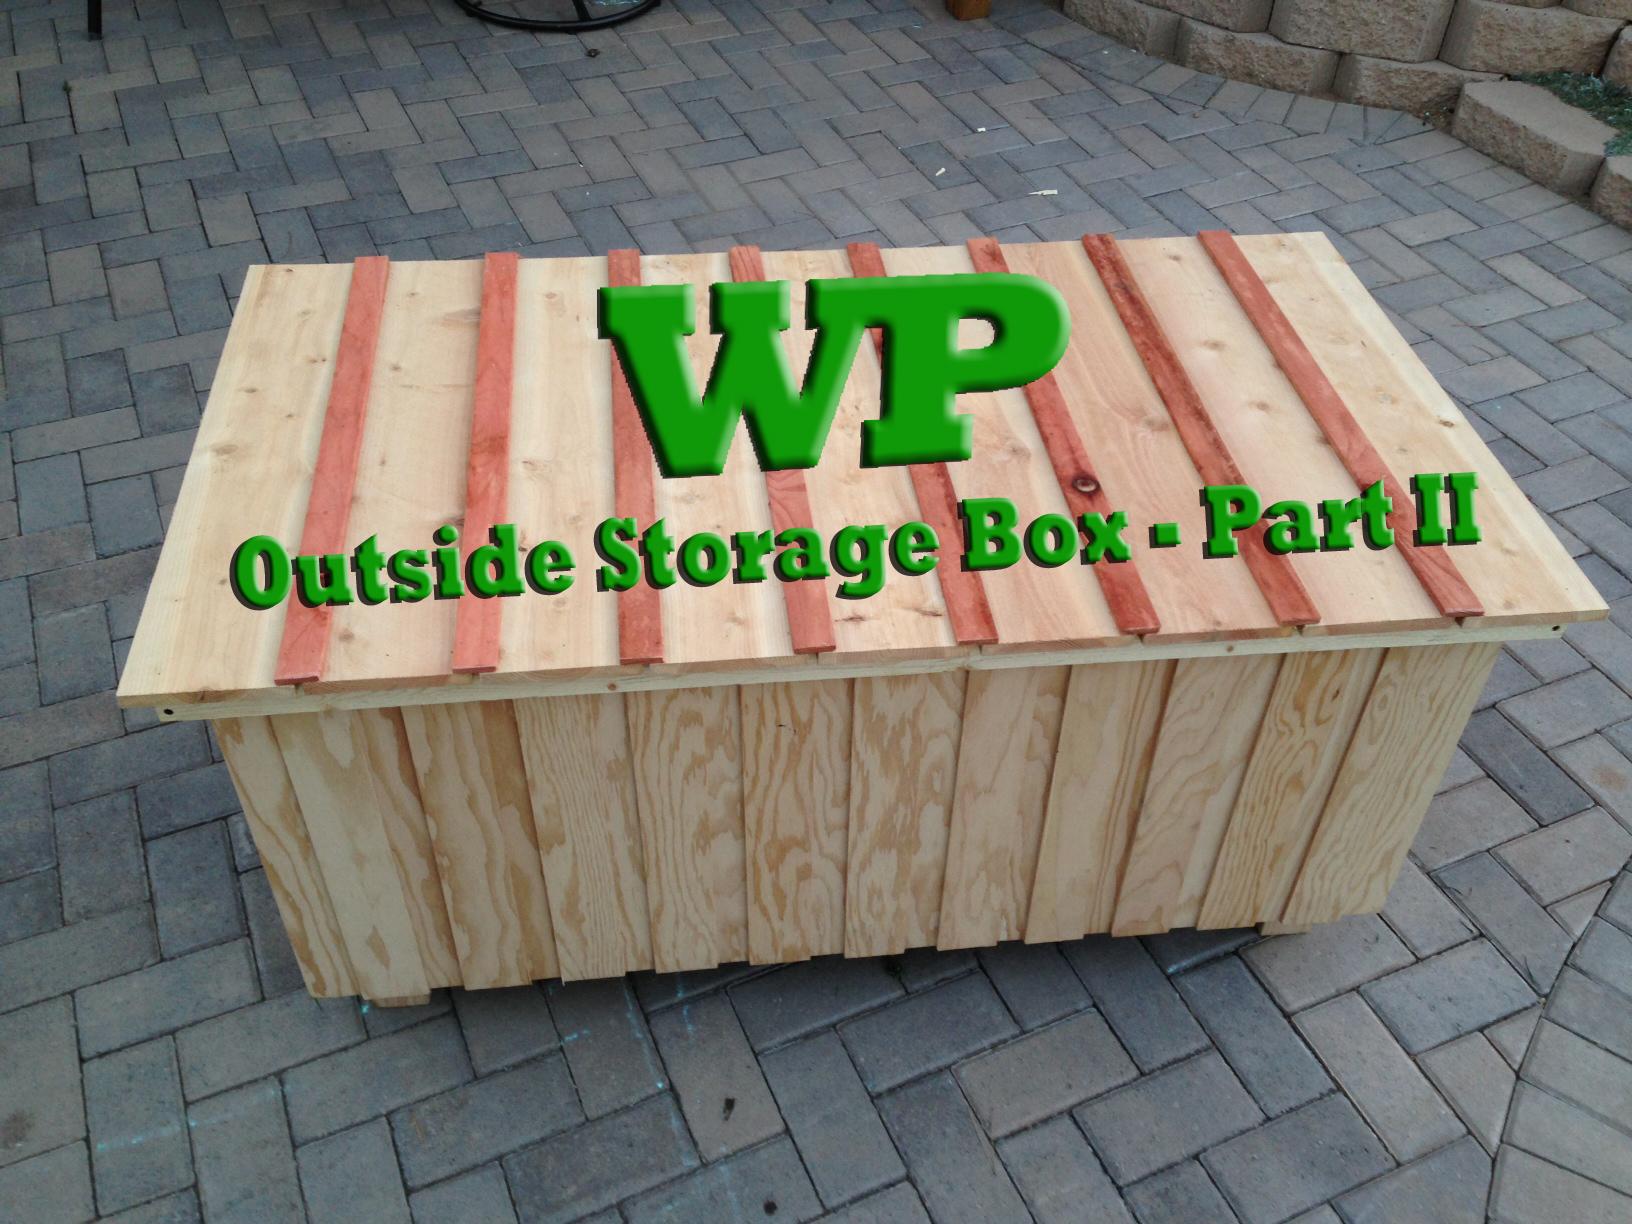 Outside Storage Box - Part II